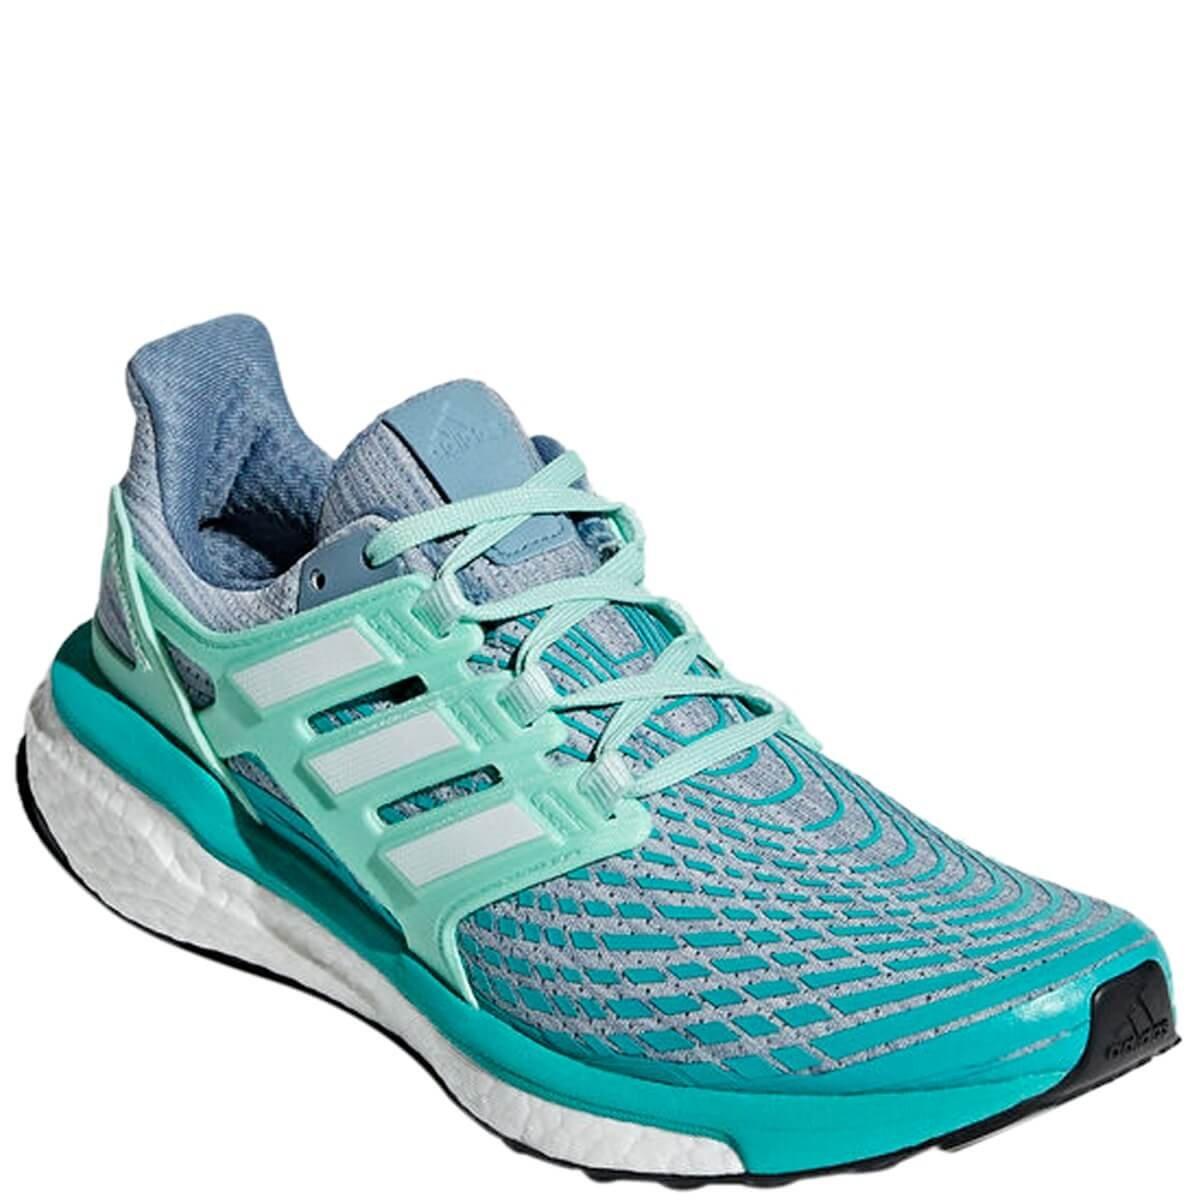 Bizz Store - Tênis Feminino Adidas Energy Boost 390bc1d330ed0